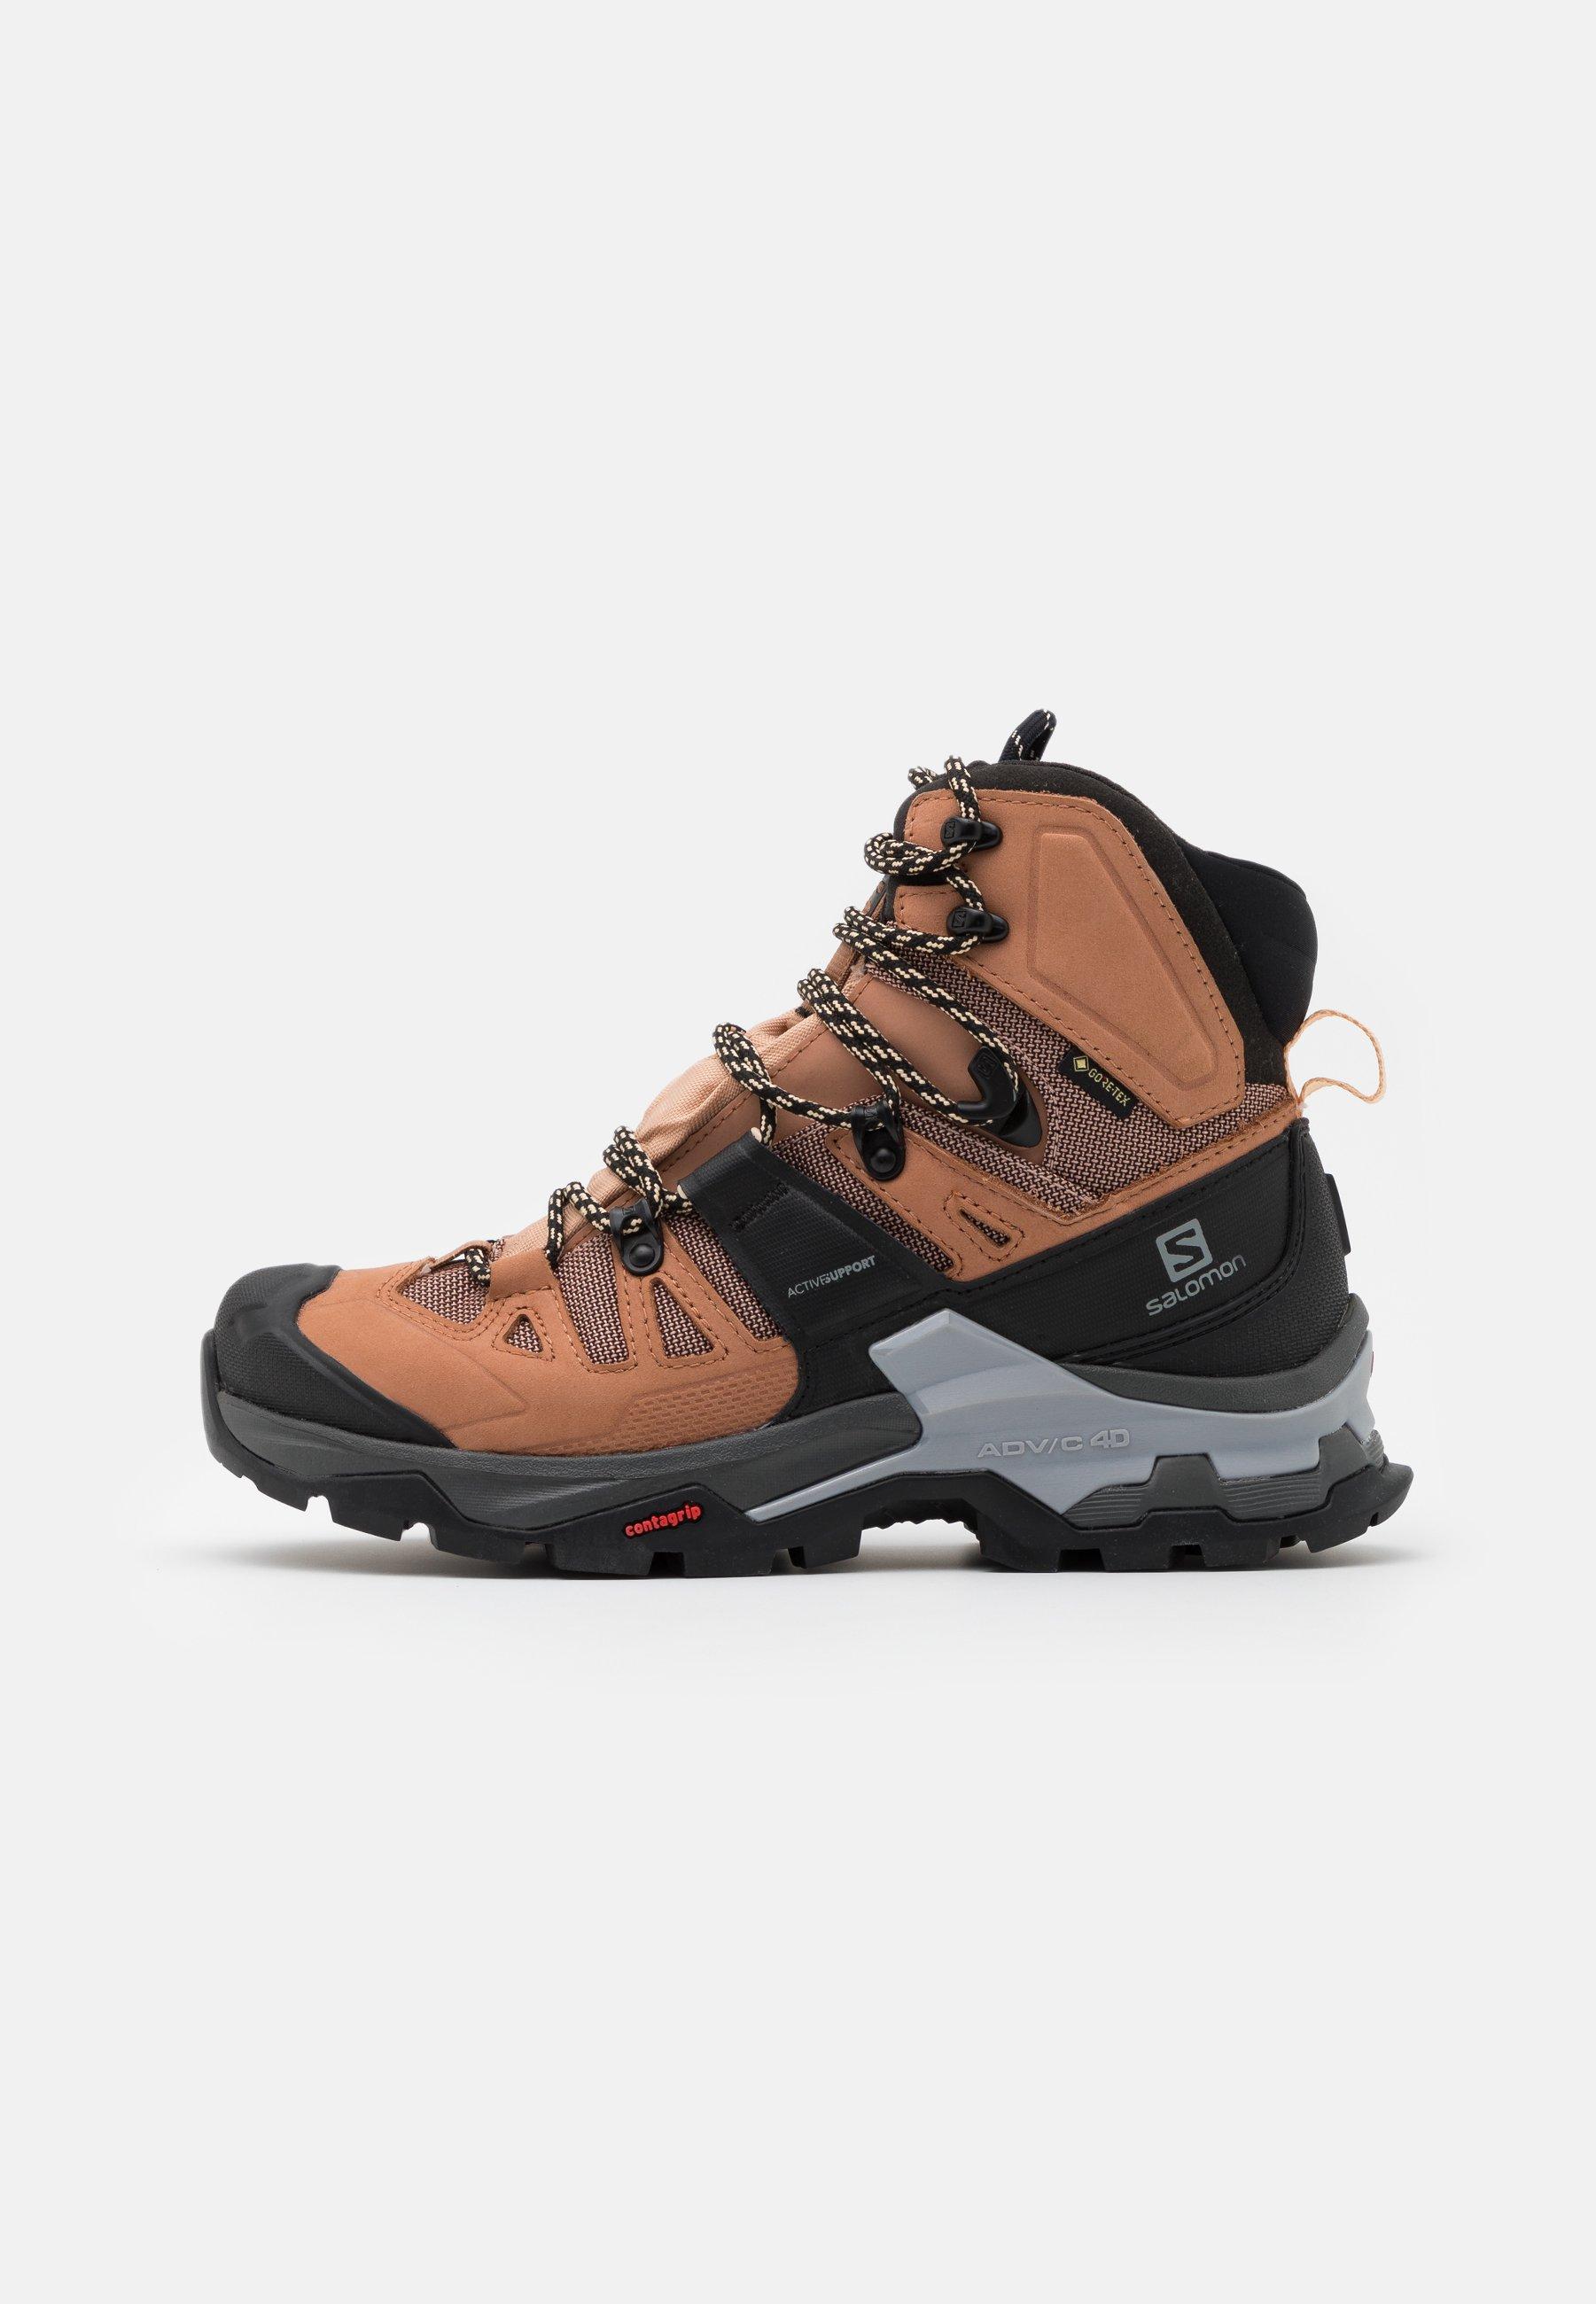 Women QUEST 4 GTX - Hiking shoes